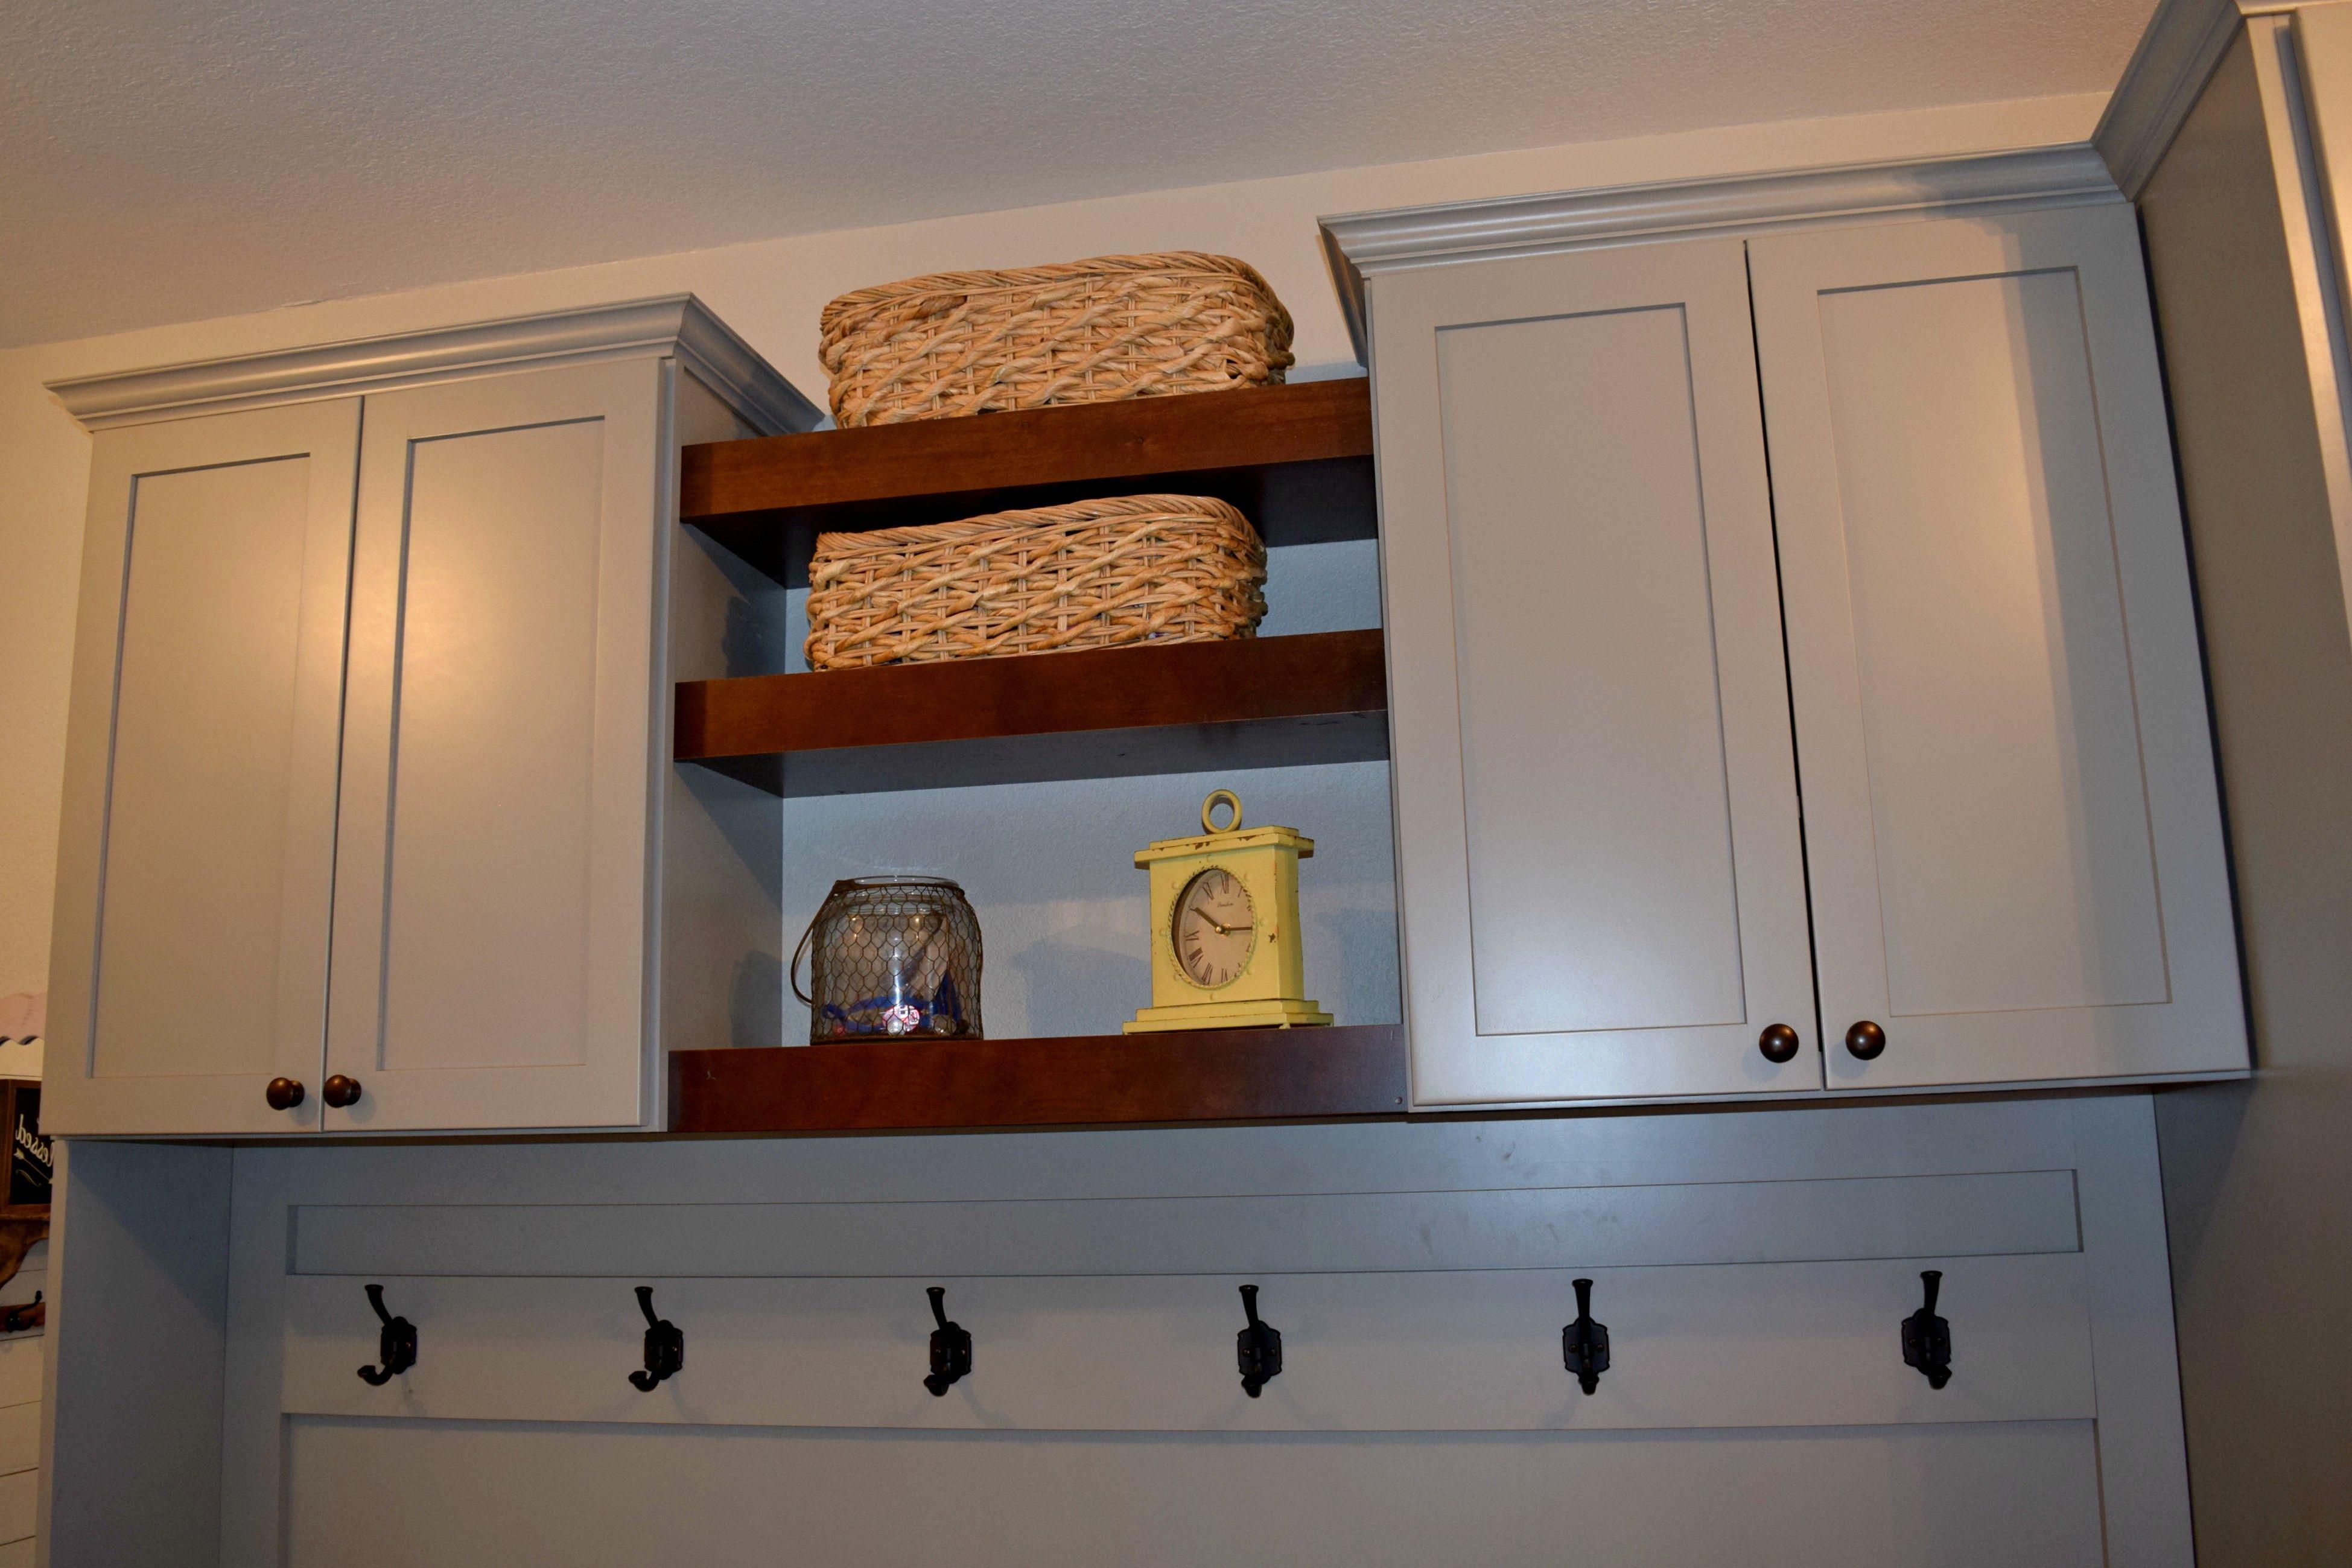 BKC Kitchen and Bath Denver laundry room cabinets Medallion